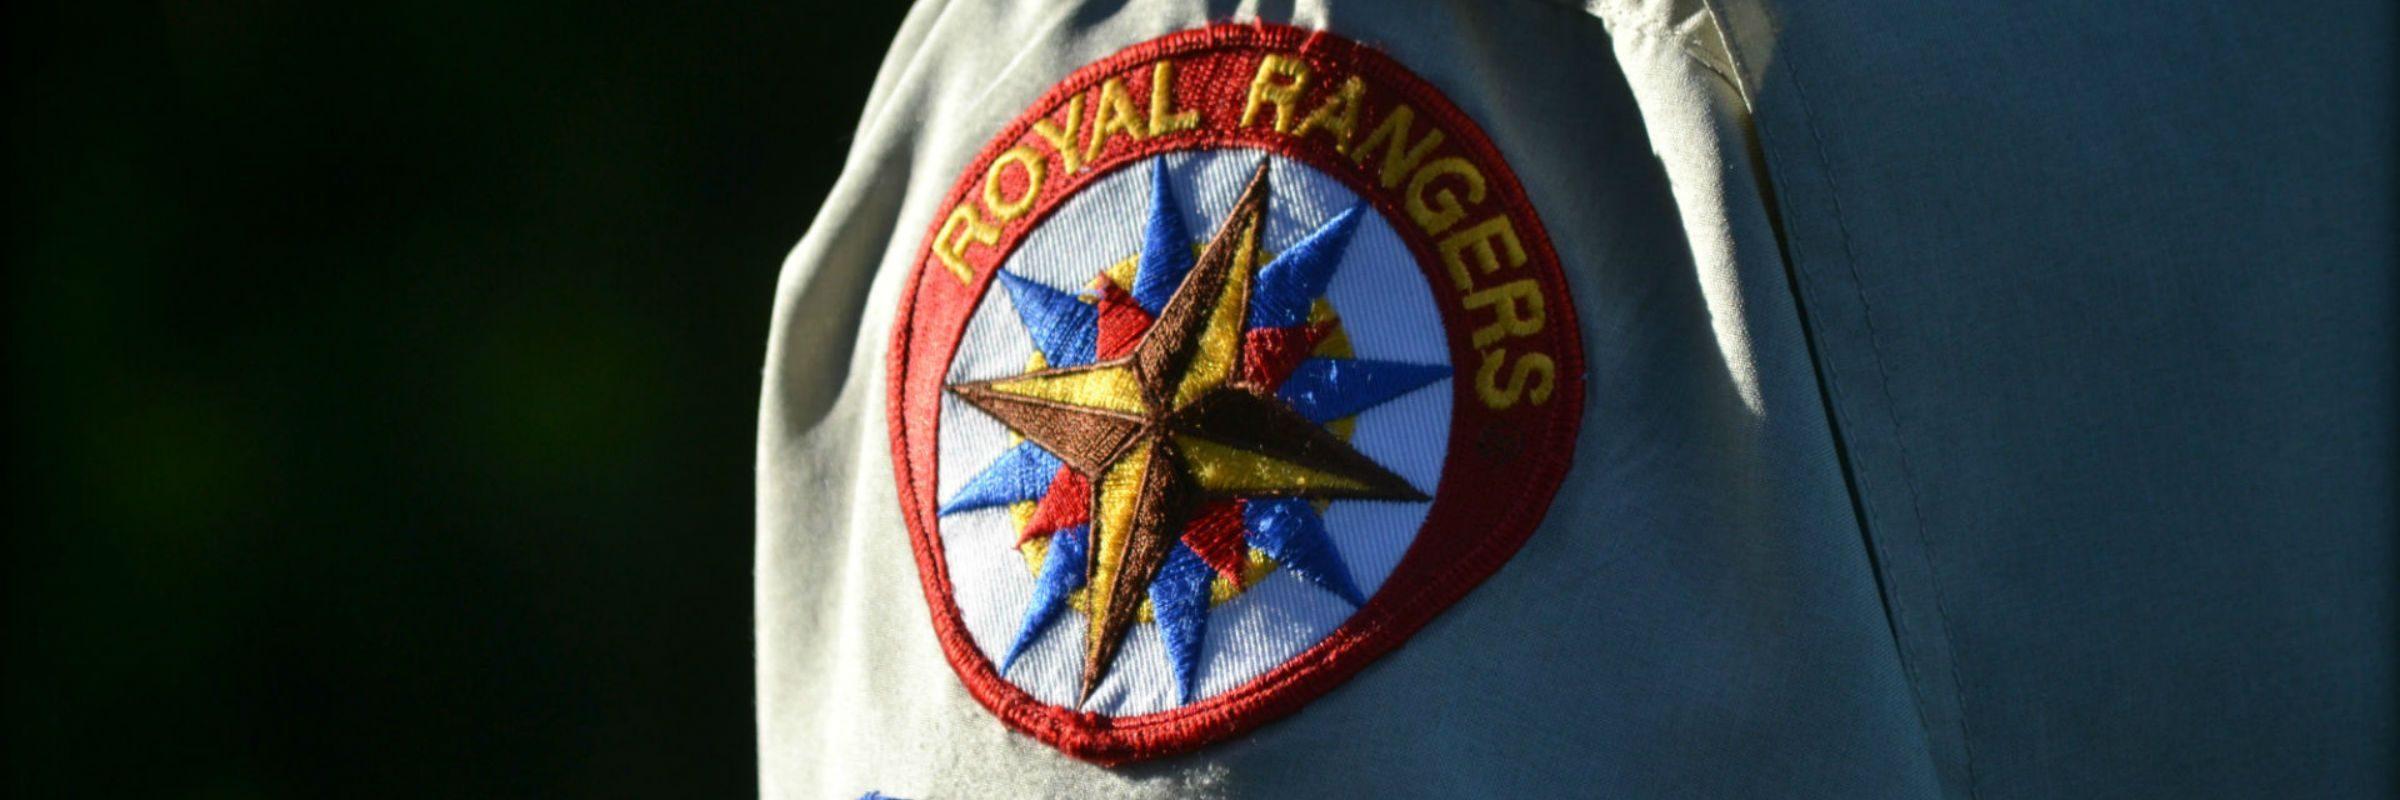 South Central Region Royal Rangers